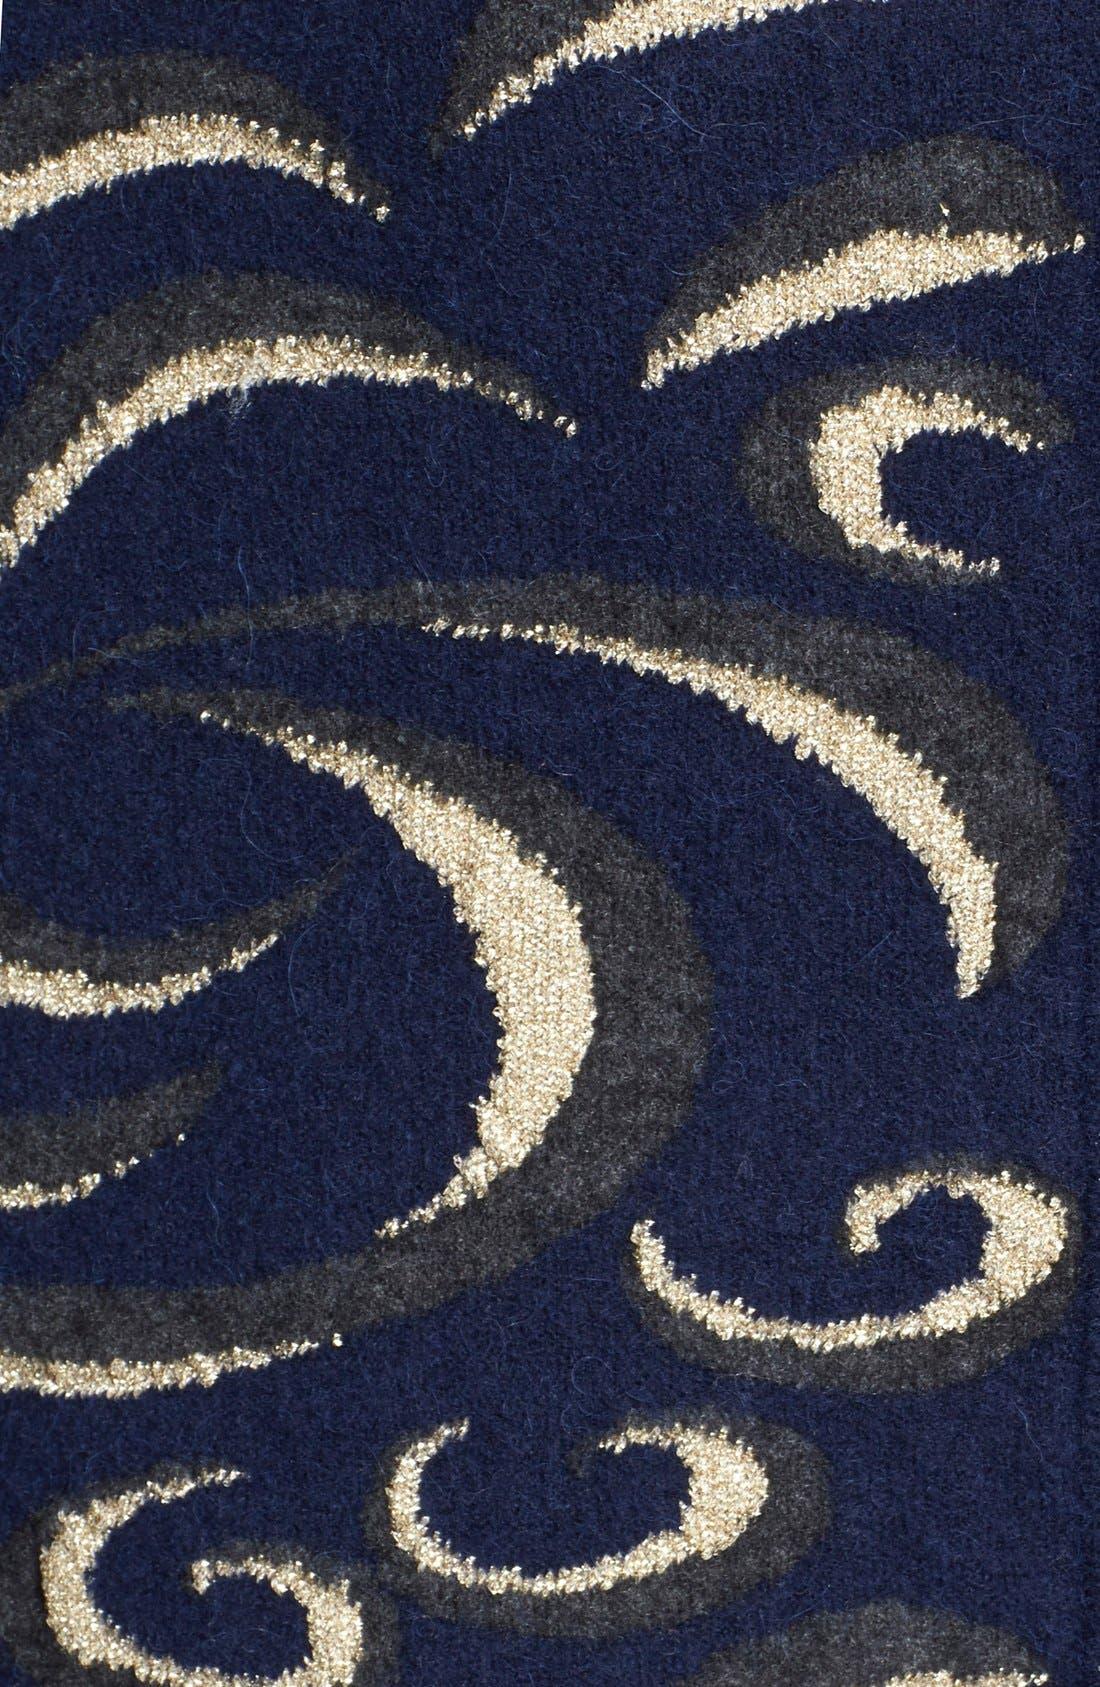 DIANE VON FURSTENBERG, 'Katarina' Oversize Knit Pullover, Alternate thumbnail 3, color, 400